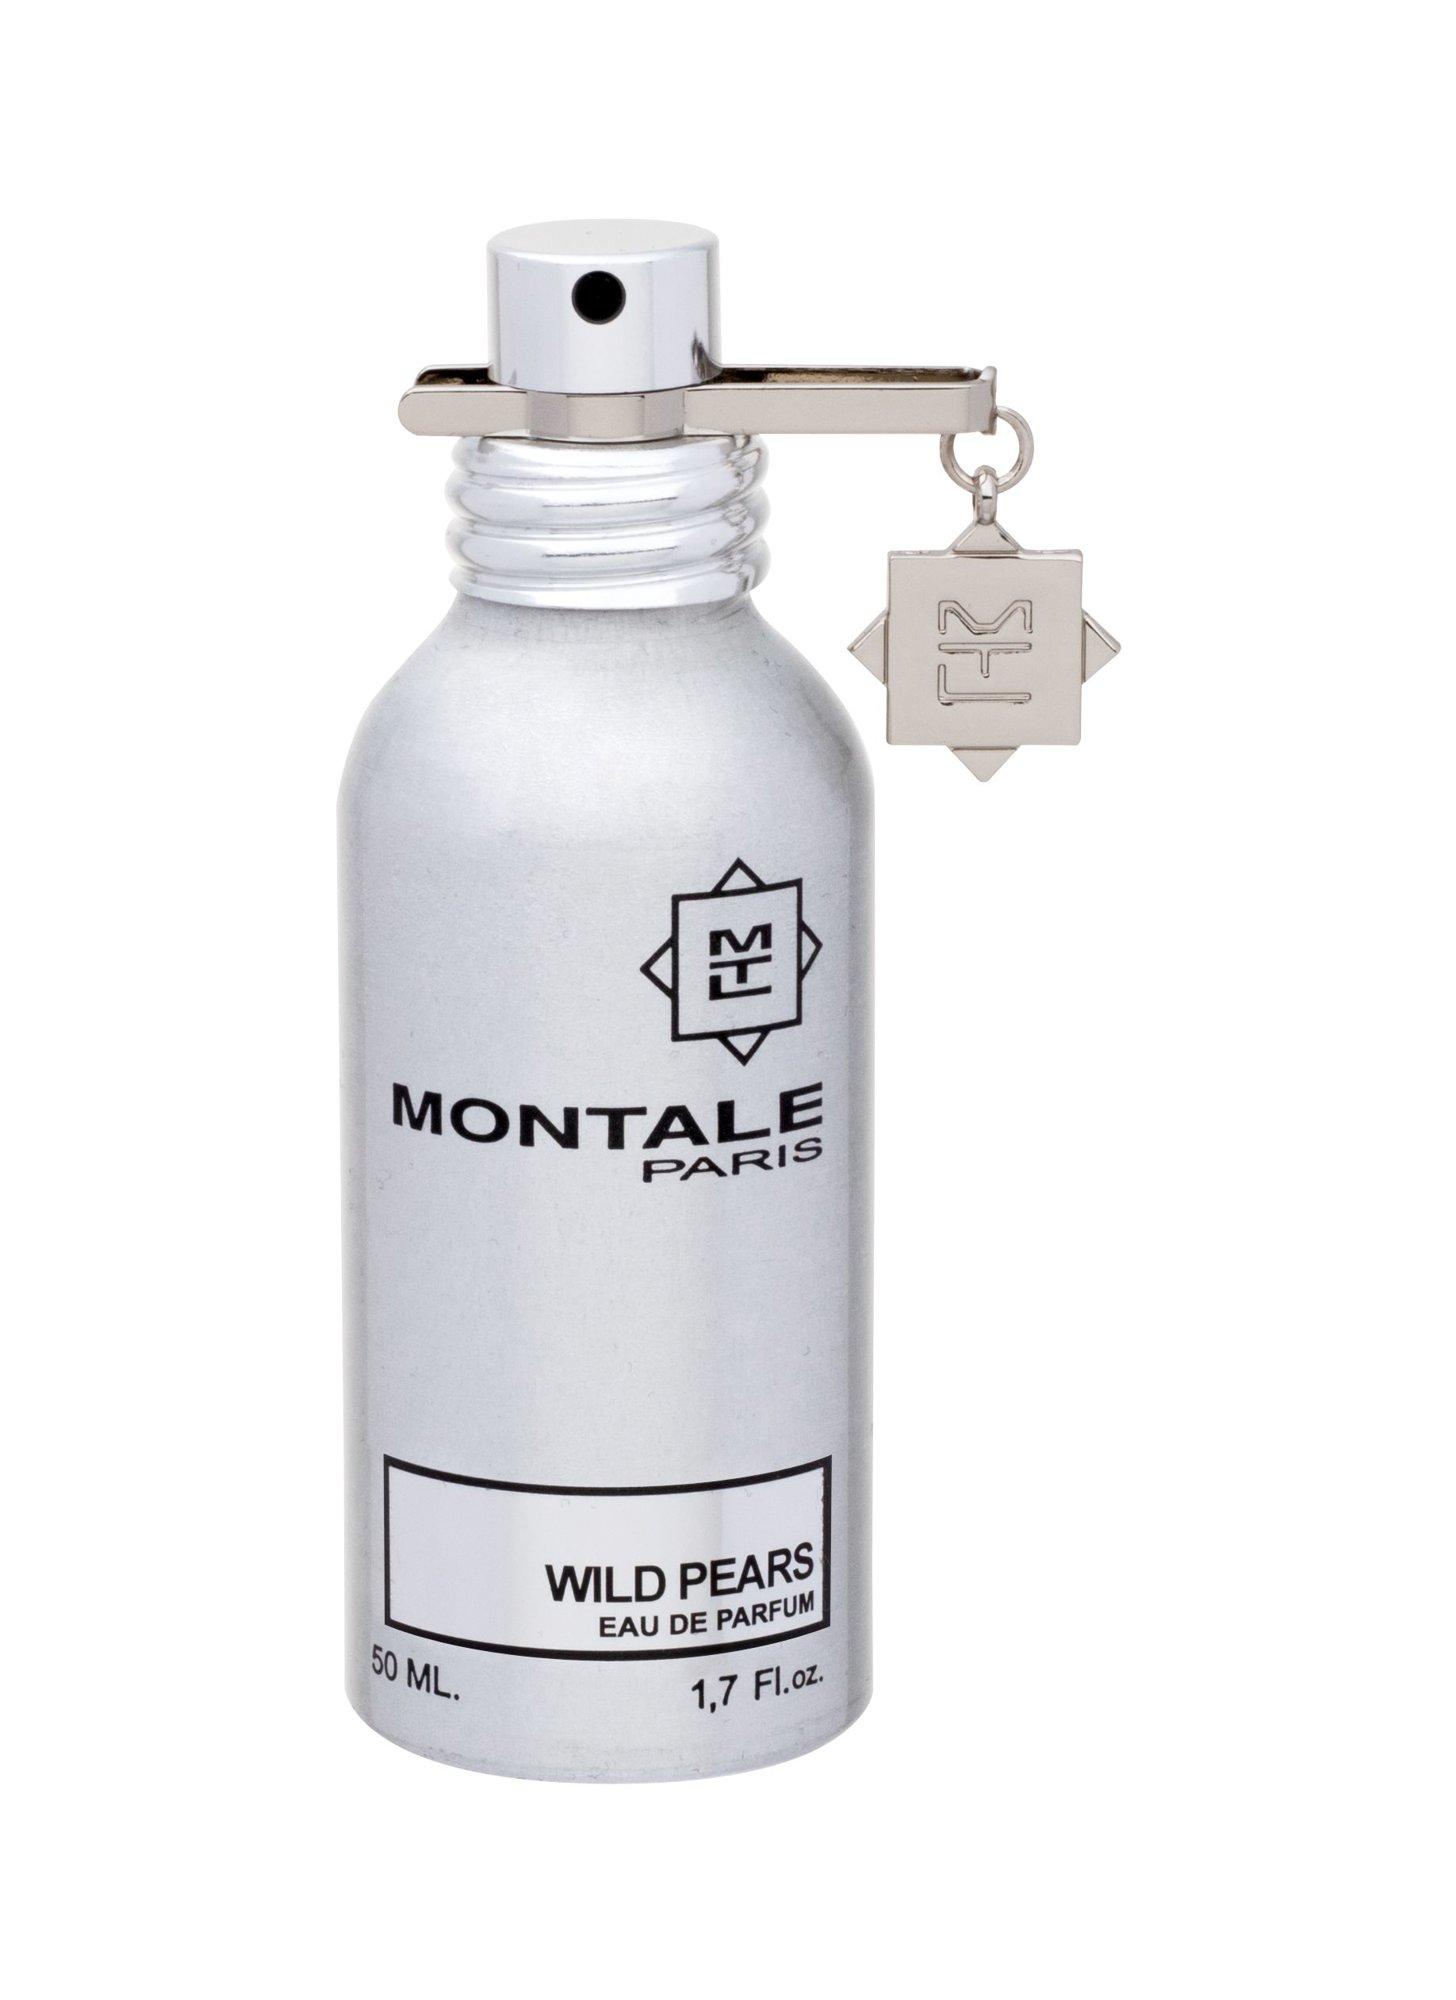 Montale Paris Wild Pears EDP 50ml